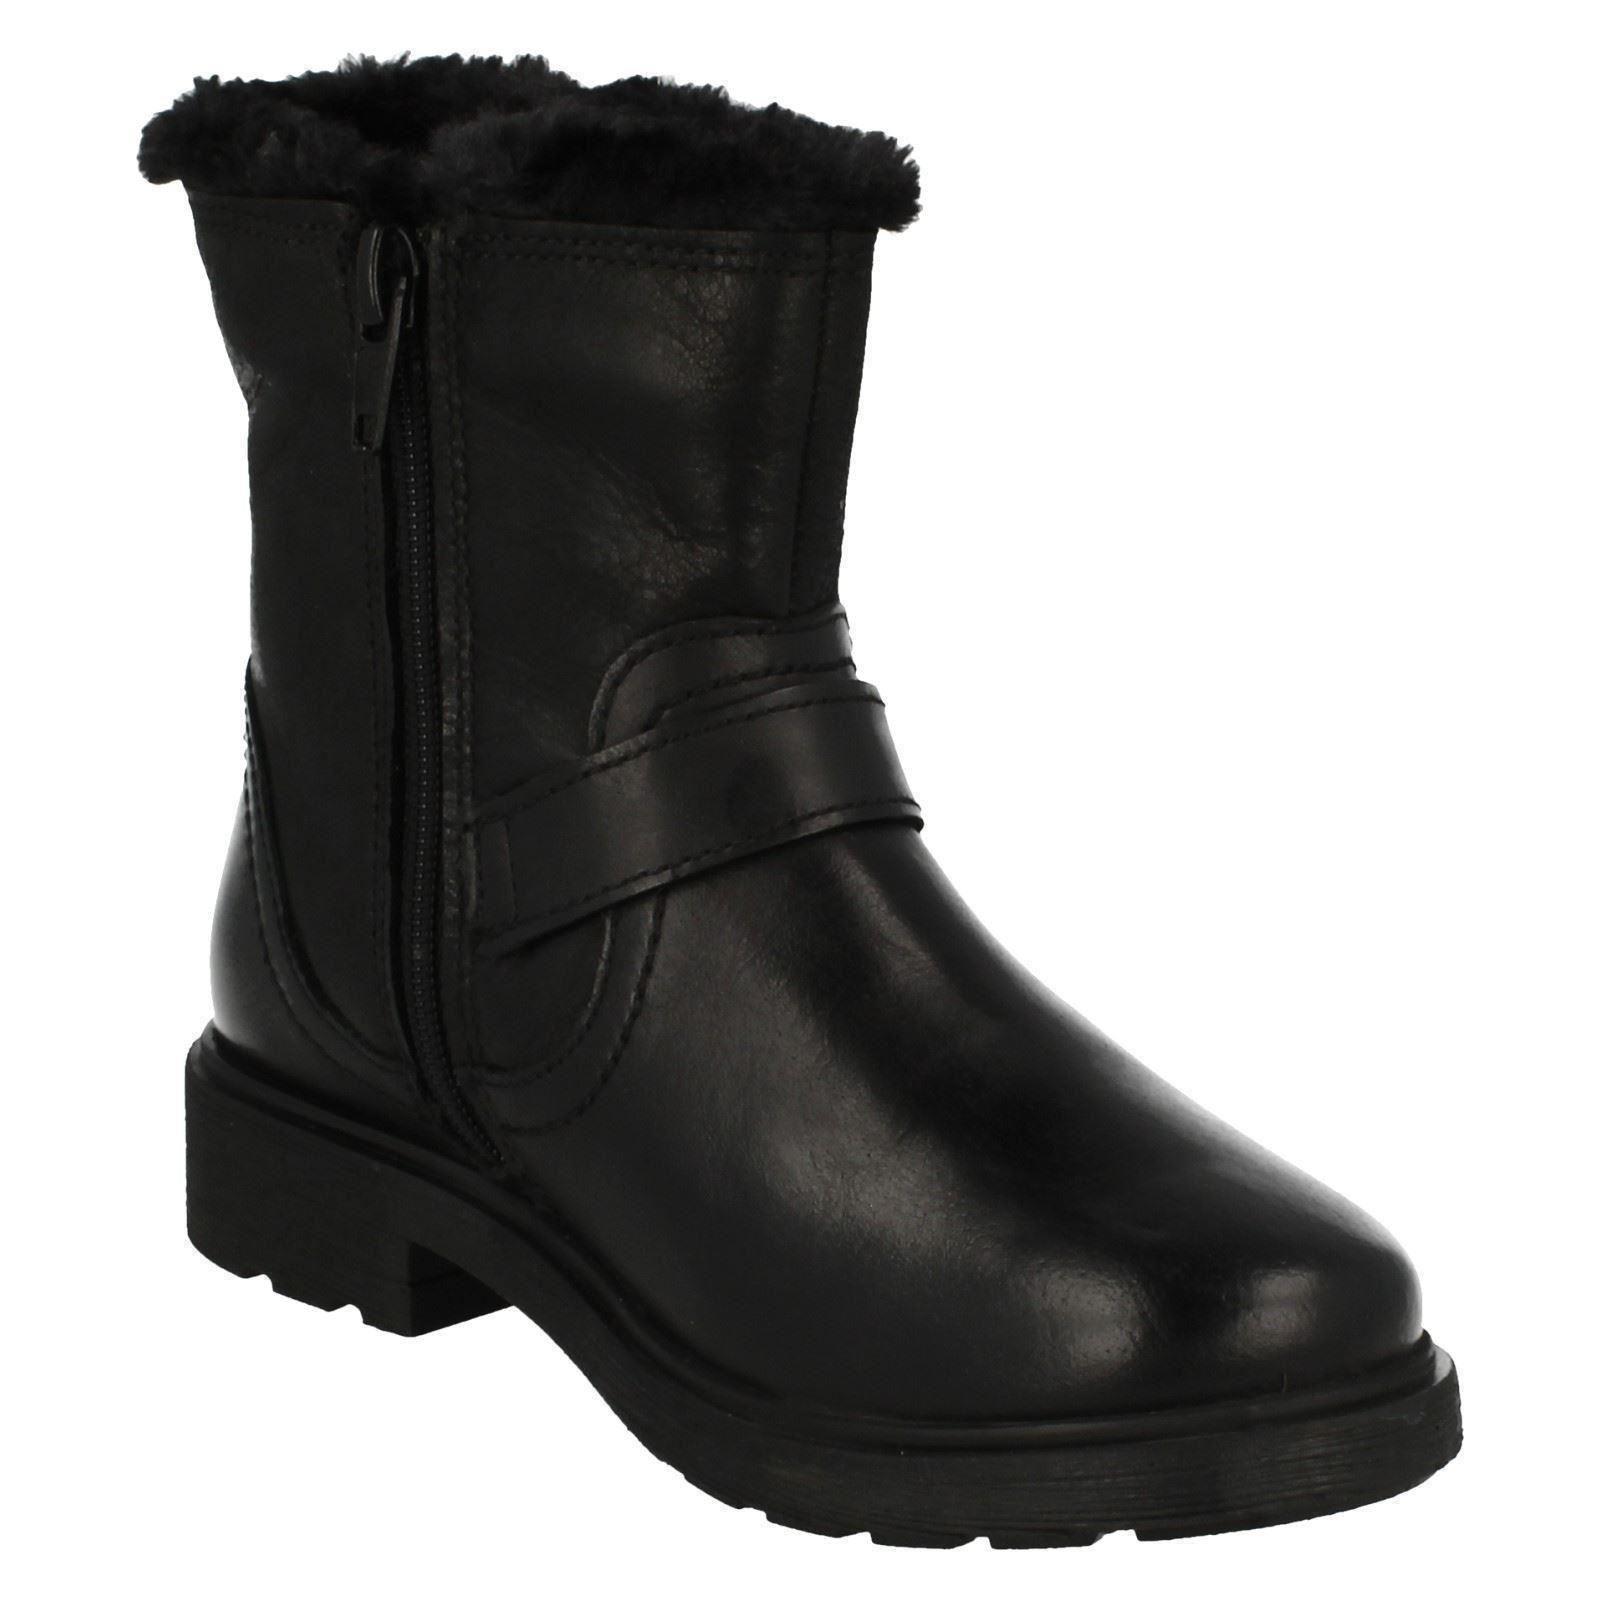 Schuhe Damen Stiefeletten Keilabsatz Keilstiefeletten 813696 Trendy Neu